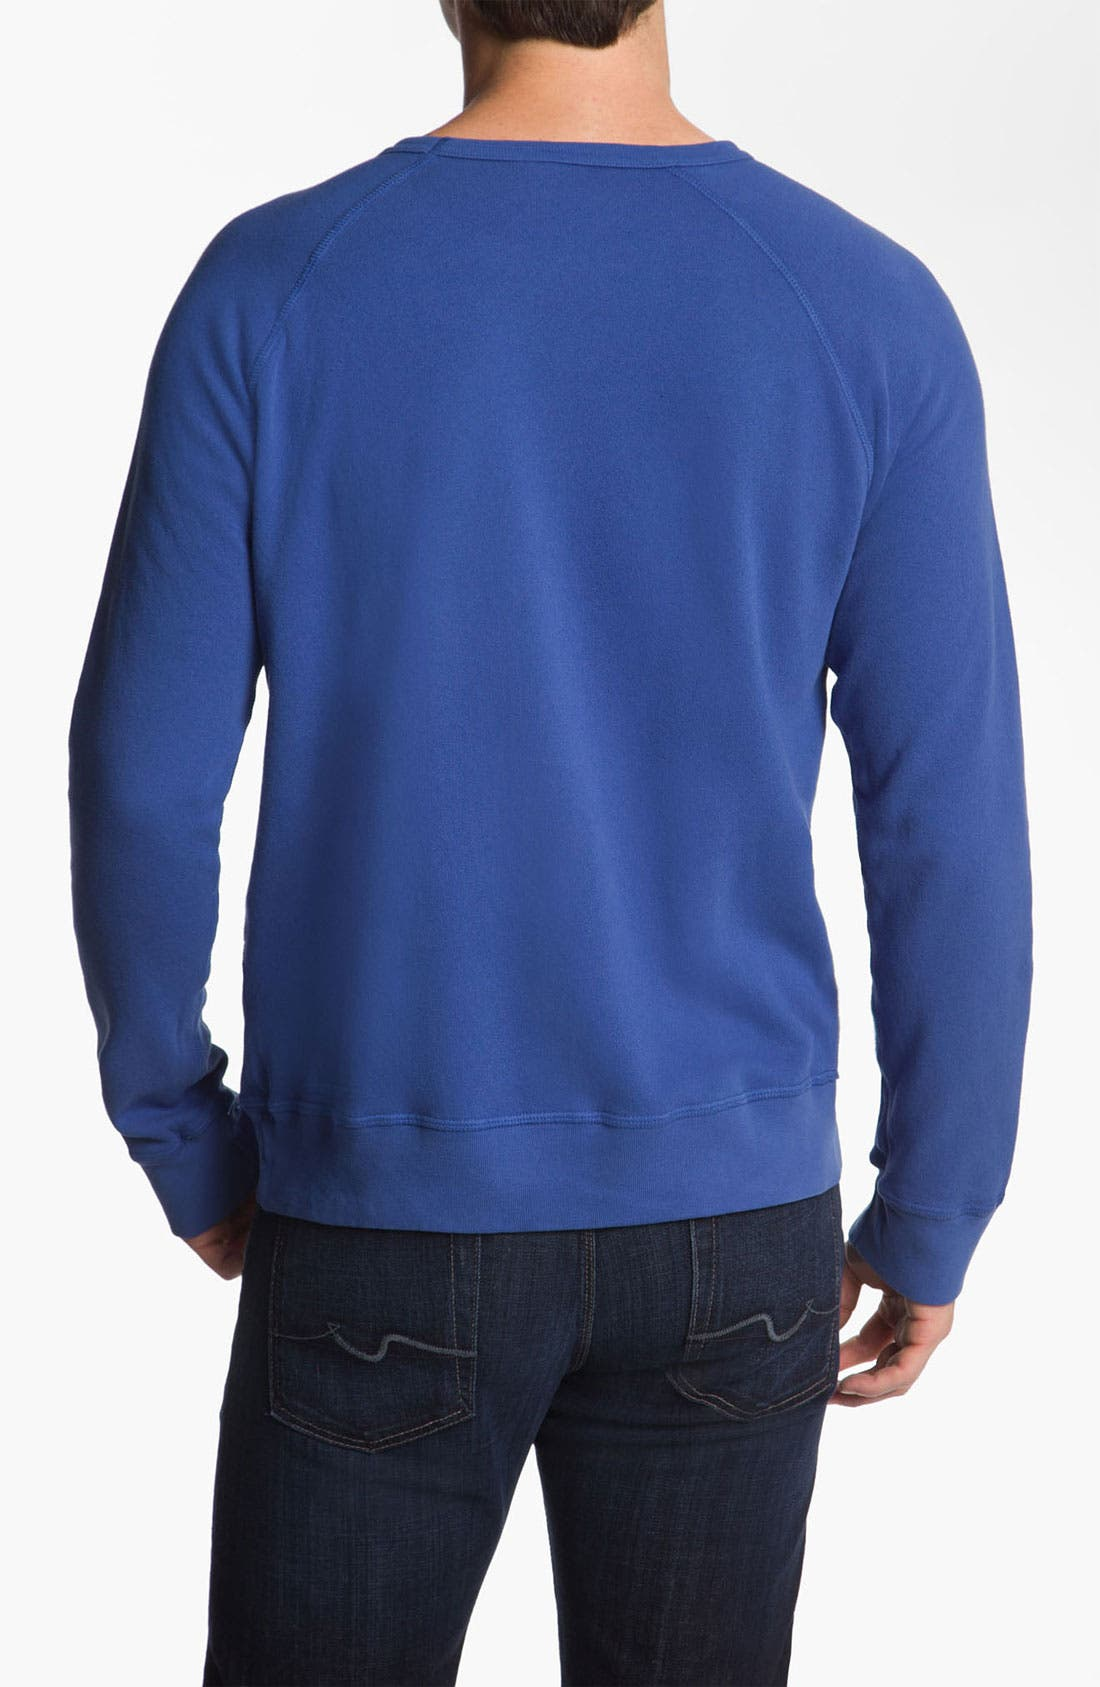 Alternate Image 2  - Junk Food 'New York Knicks' Sweatshirt